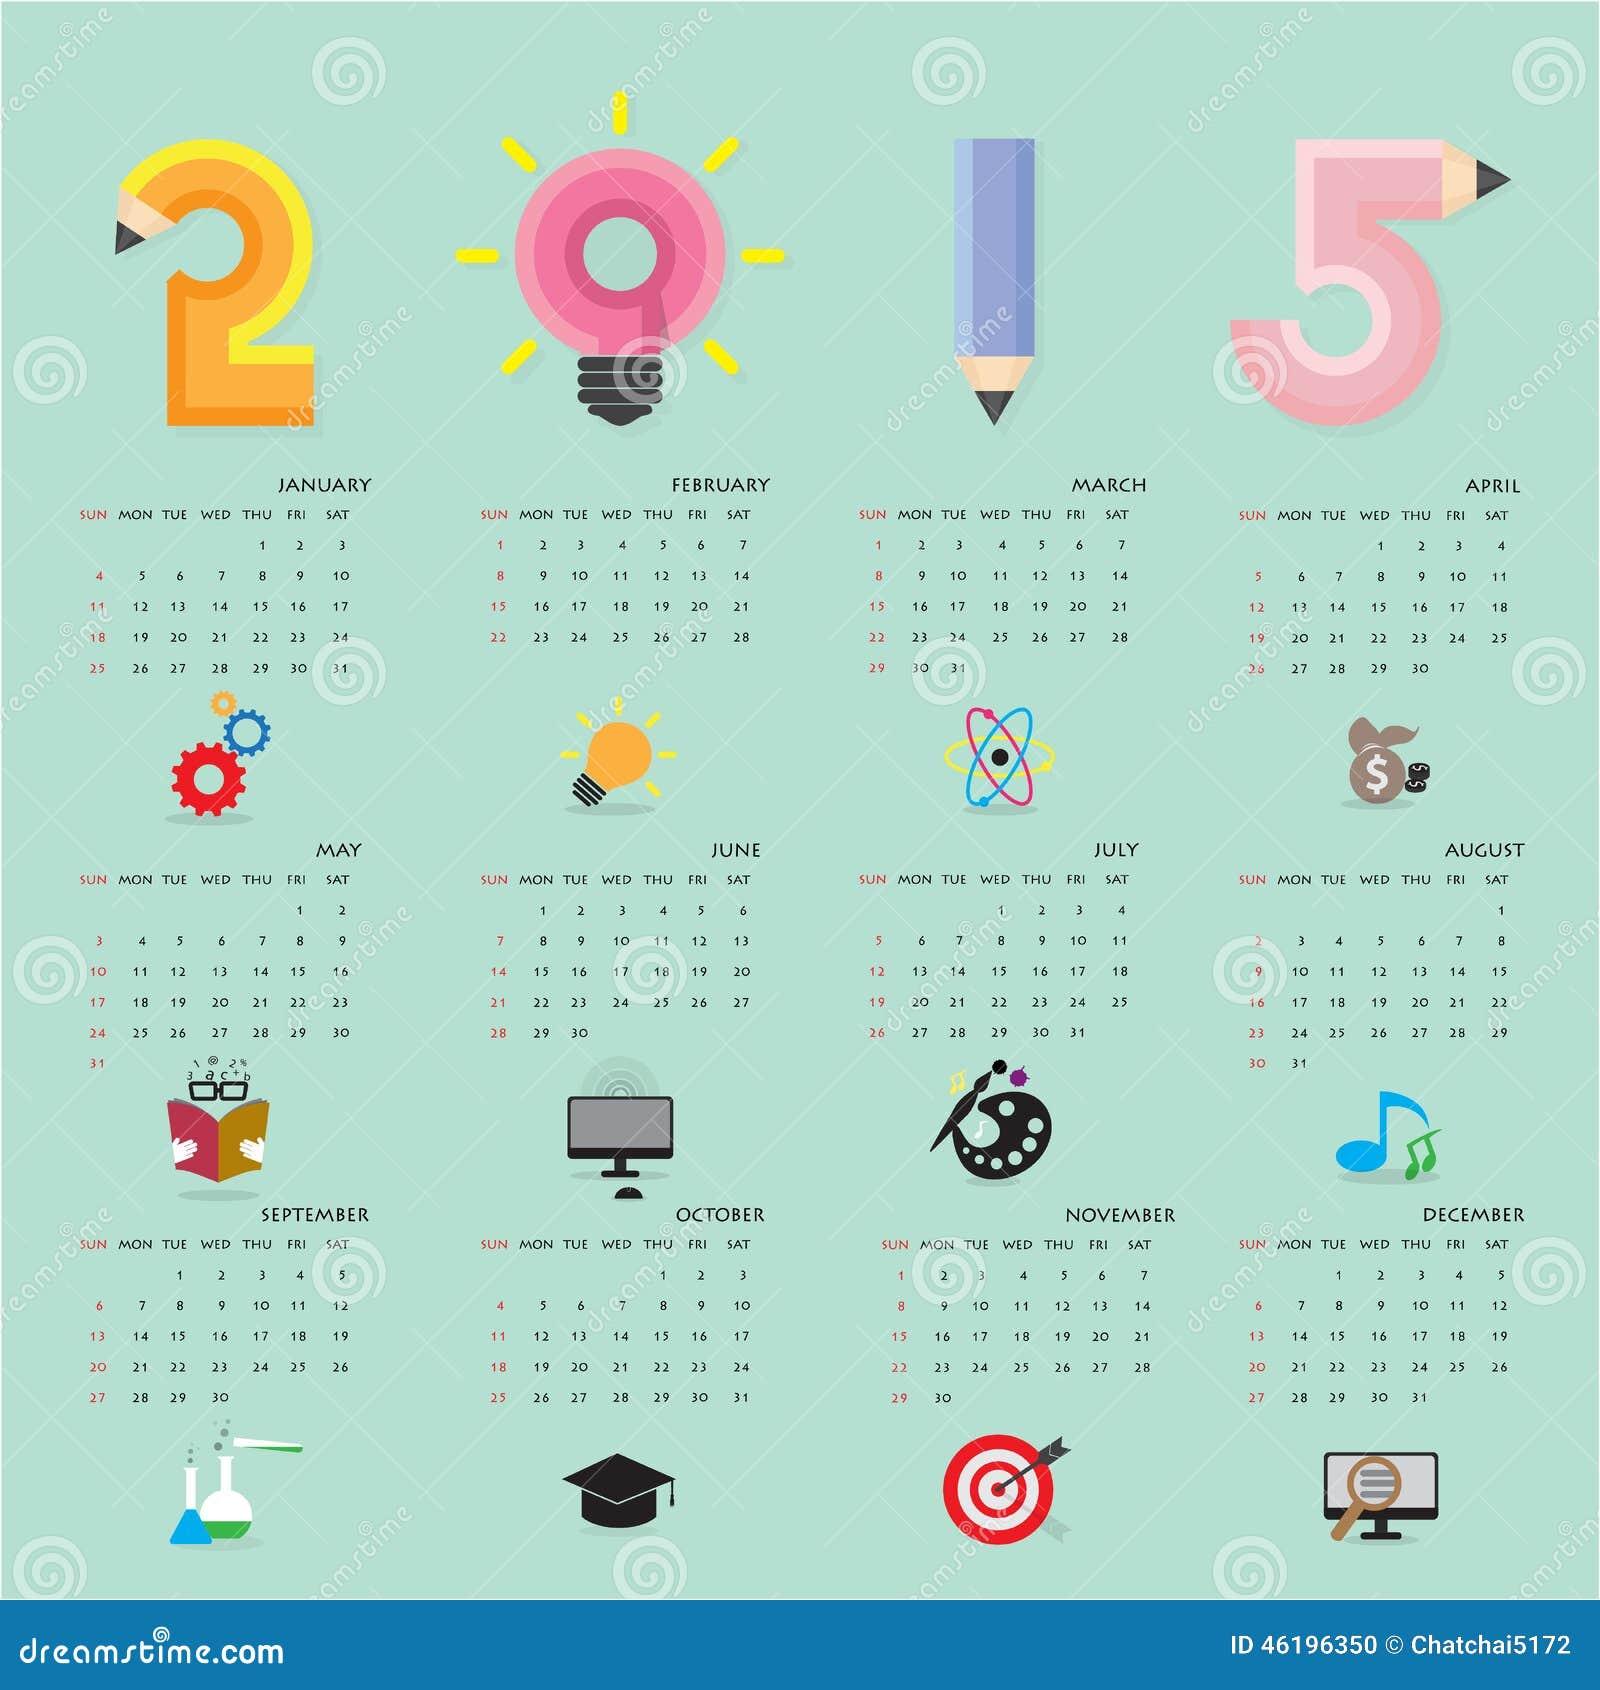 Creative Calendar 2015 Design Template With Business Or